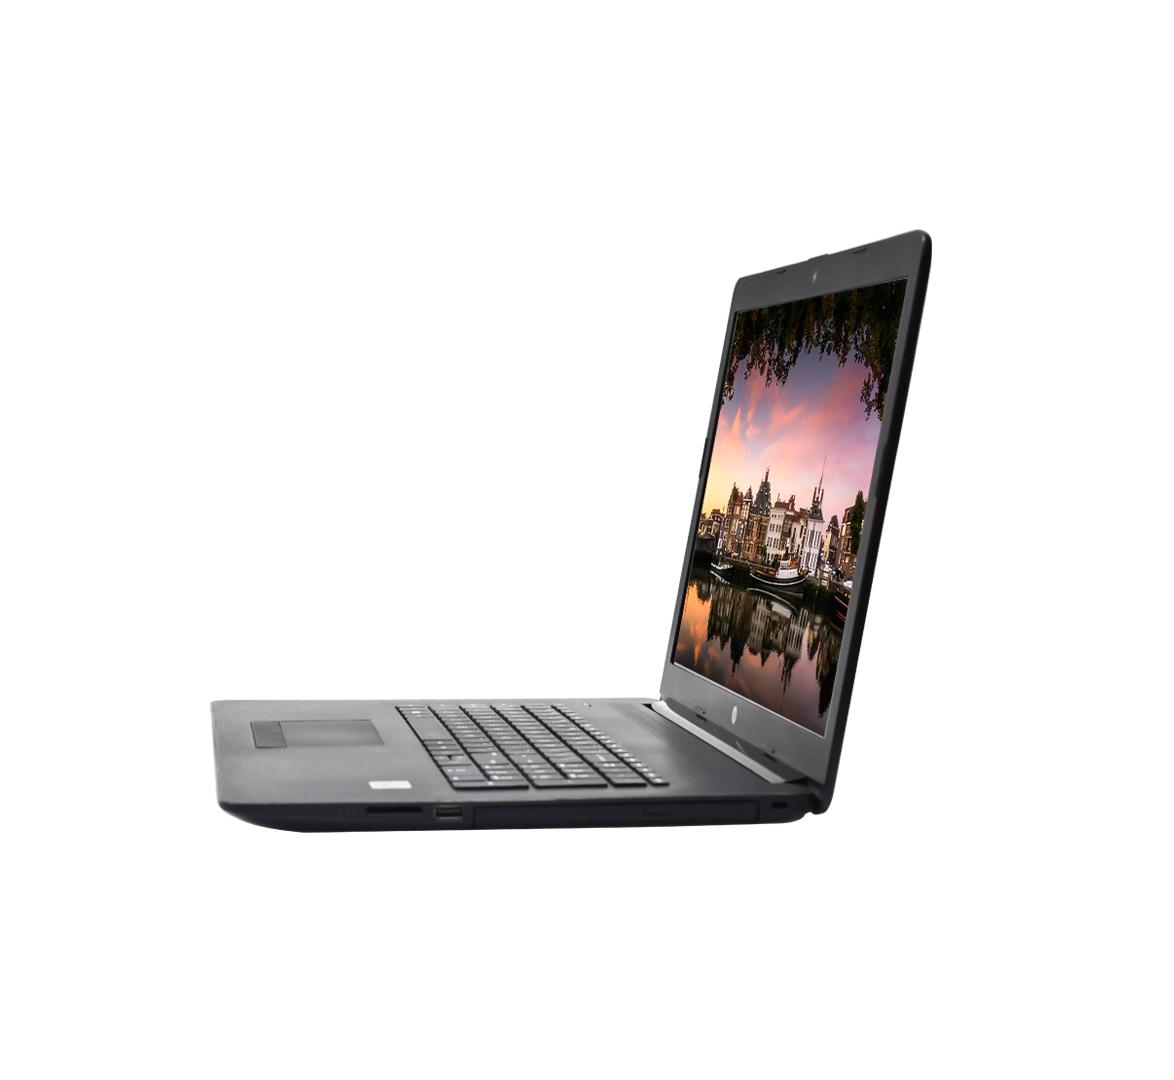 HP Pavilion 17 Notebook PC Business Laptop, Intel Core i5-1035G1 CPU, 8GB DDR4 SODIMM RAM, 256GB SSD M2, 17 inch Display, Windows 10 Pro (Refurbished)